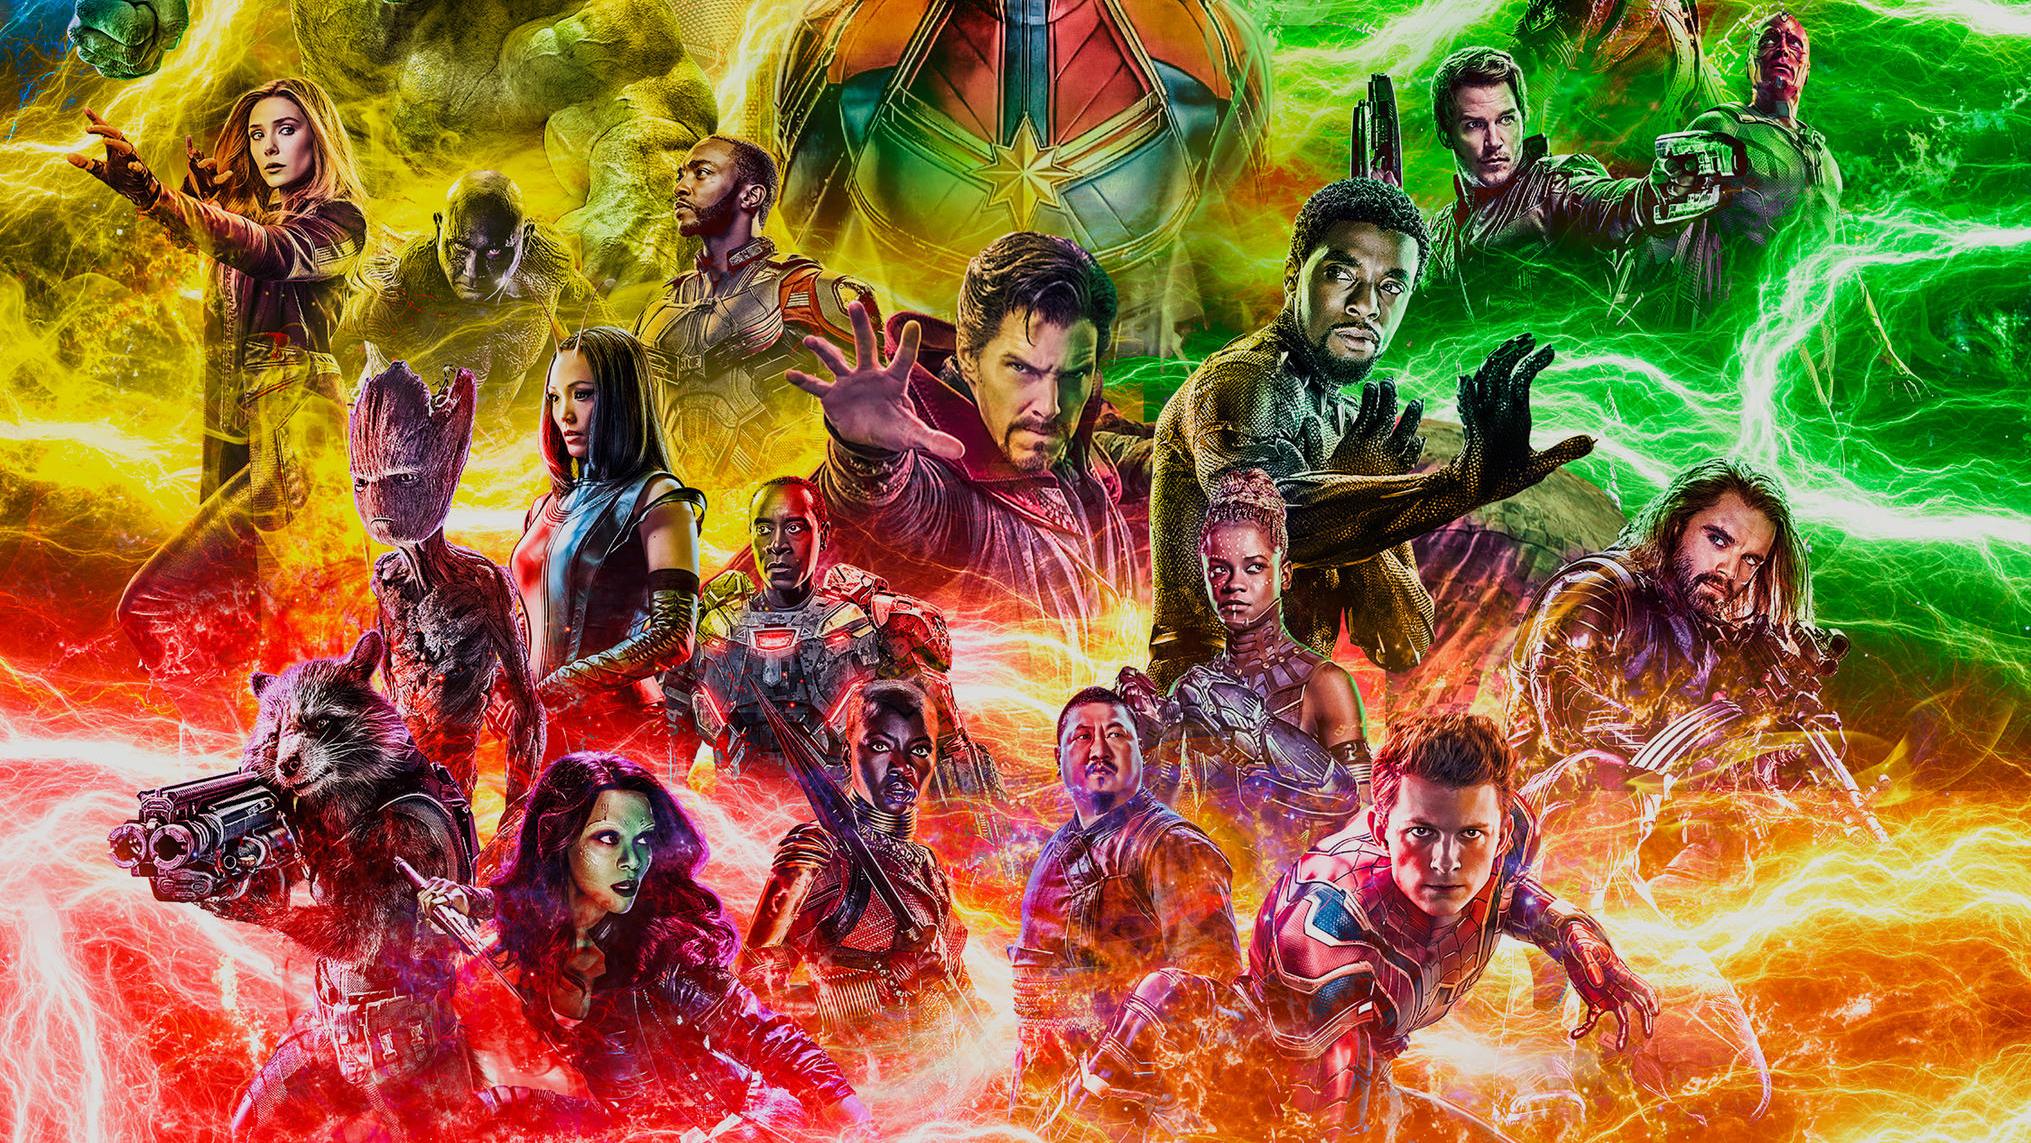 Wallpaper Avengers Endgame Avengers 4 Hd Movies 16872: Avengers End Game Fan Artworks, HD Superheroes, 4k